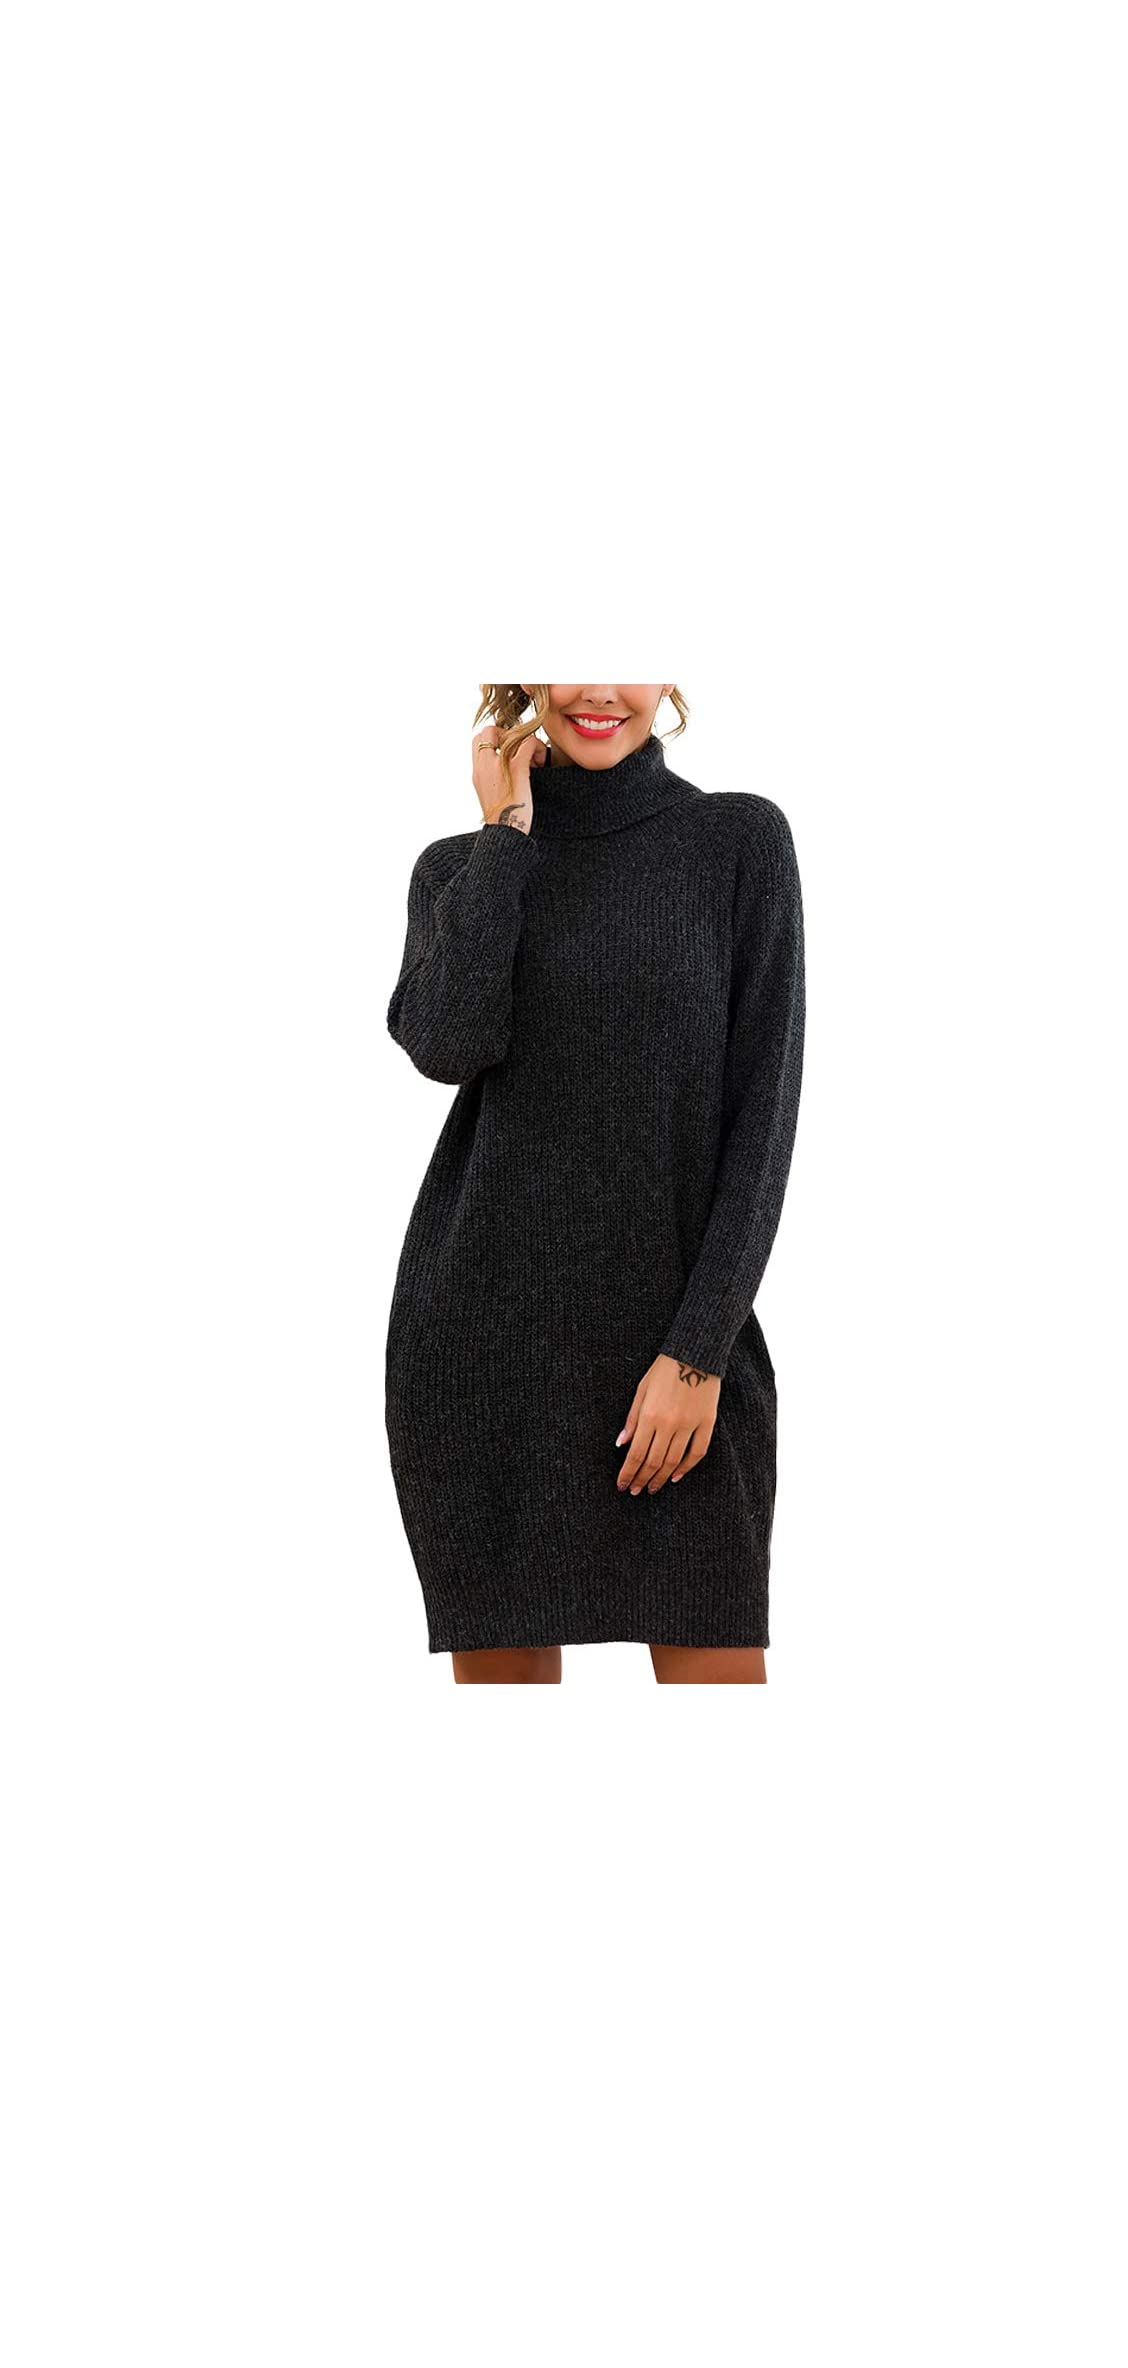 Women's Loose Turtleneck Long Sleeve Knit Pullover Dress